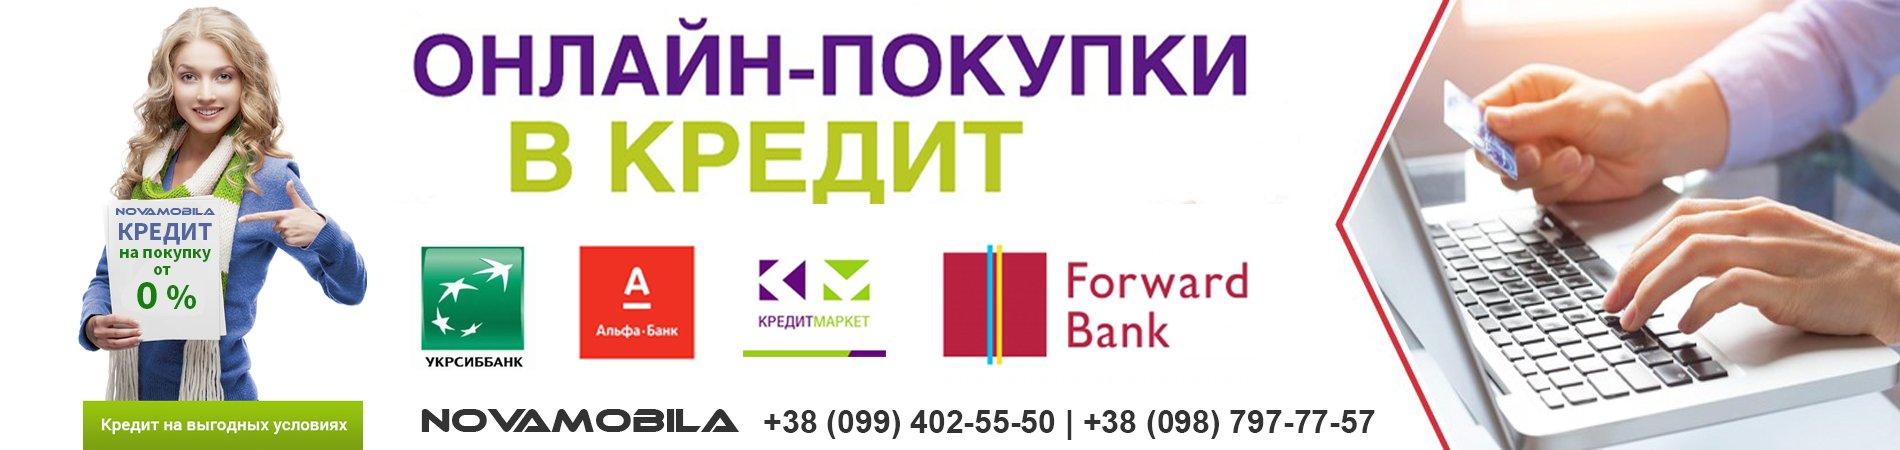 kreditbank